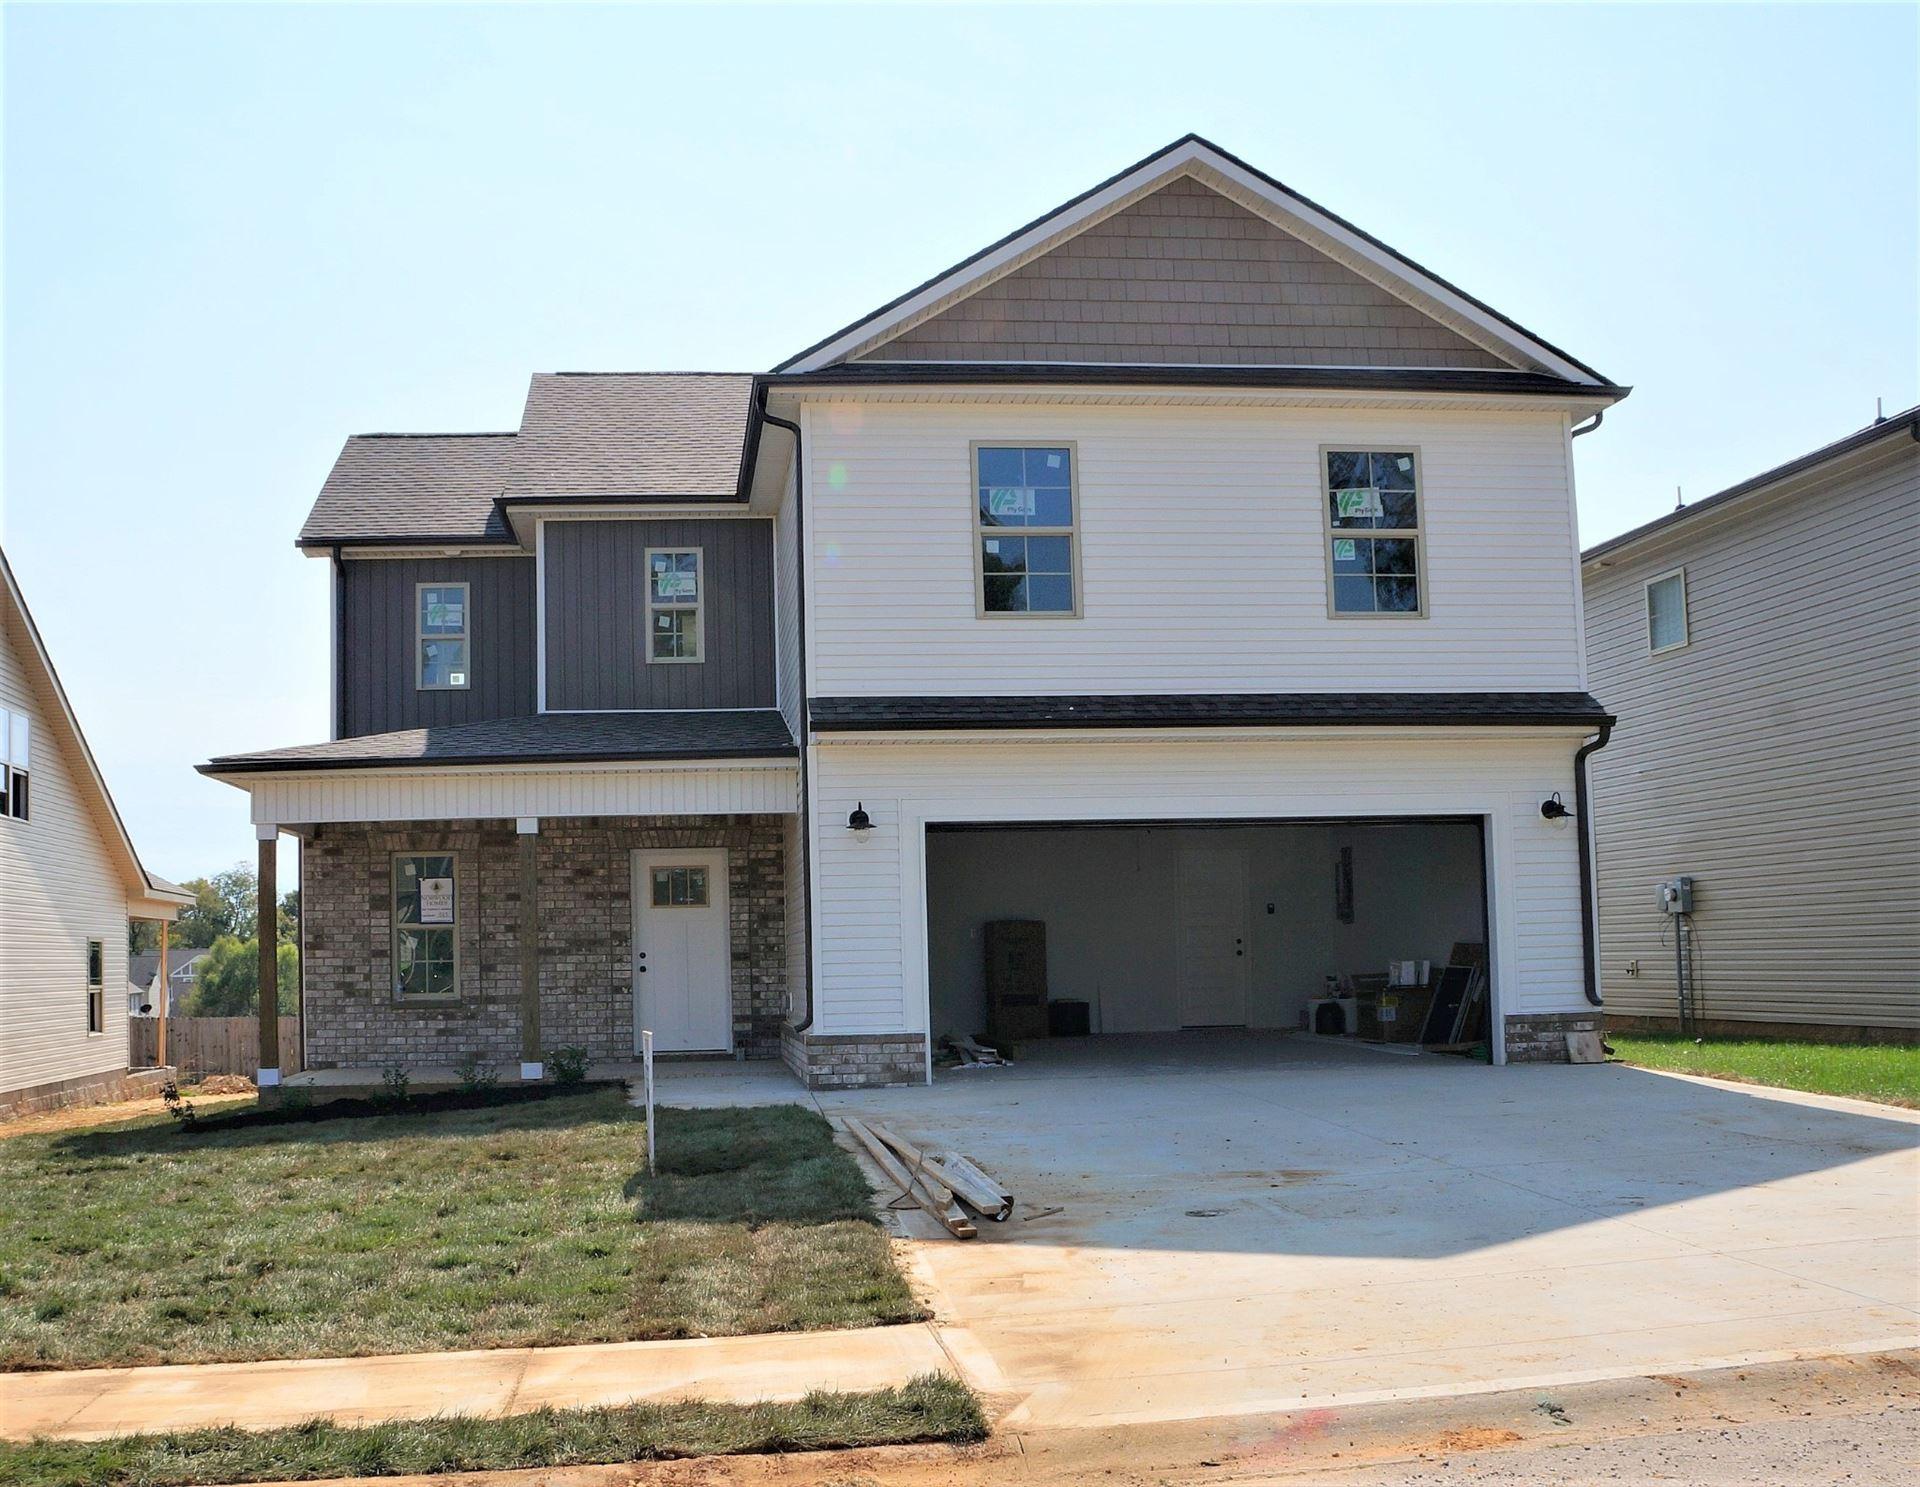 689 Elm St, Clarksville, TN 37040 - MLS#: 2171514